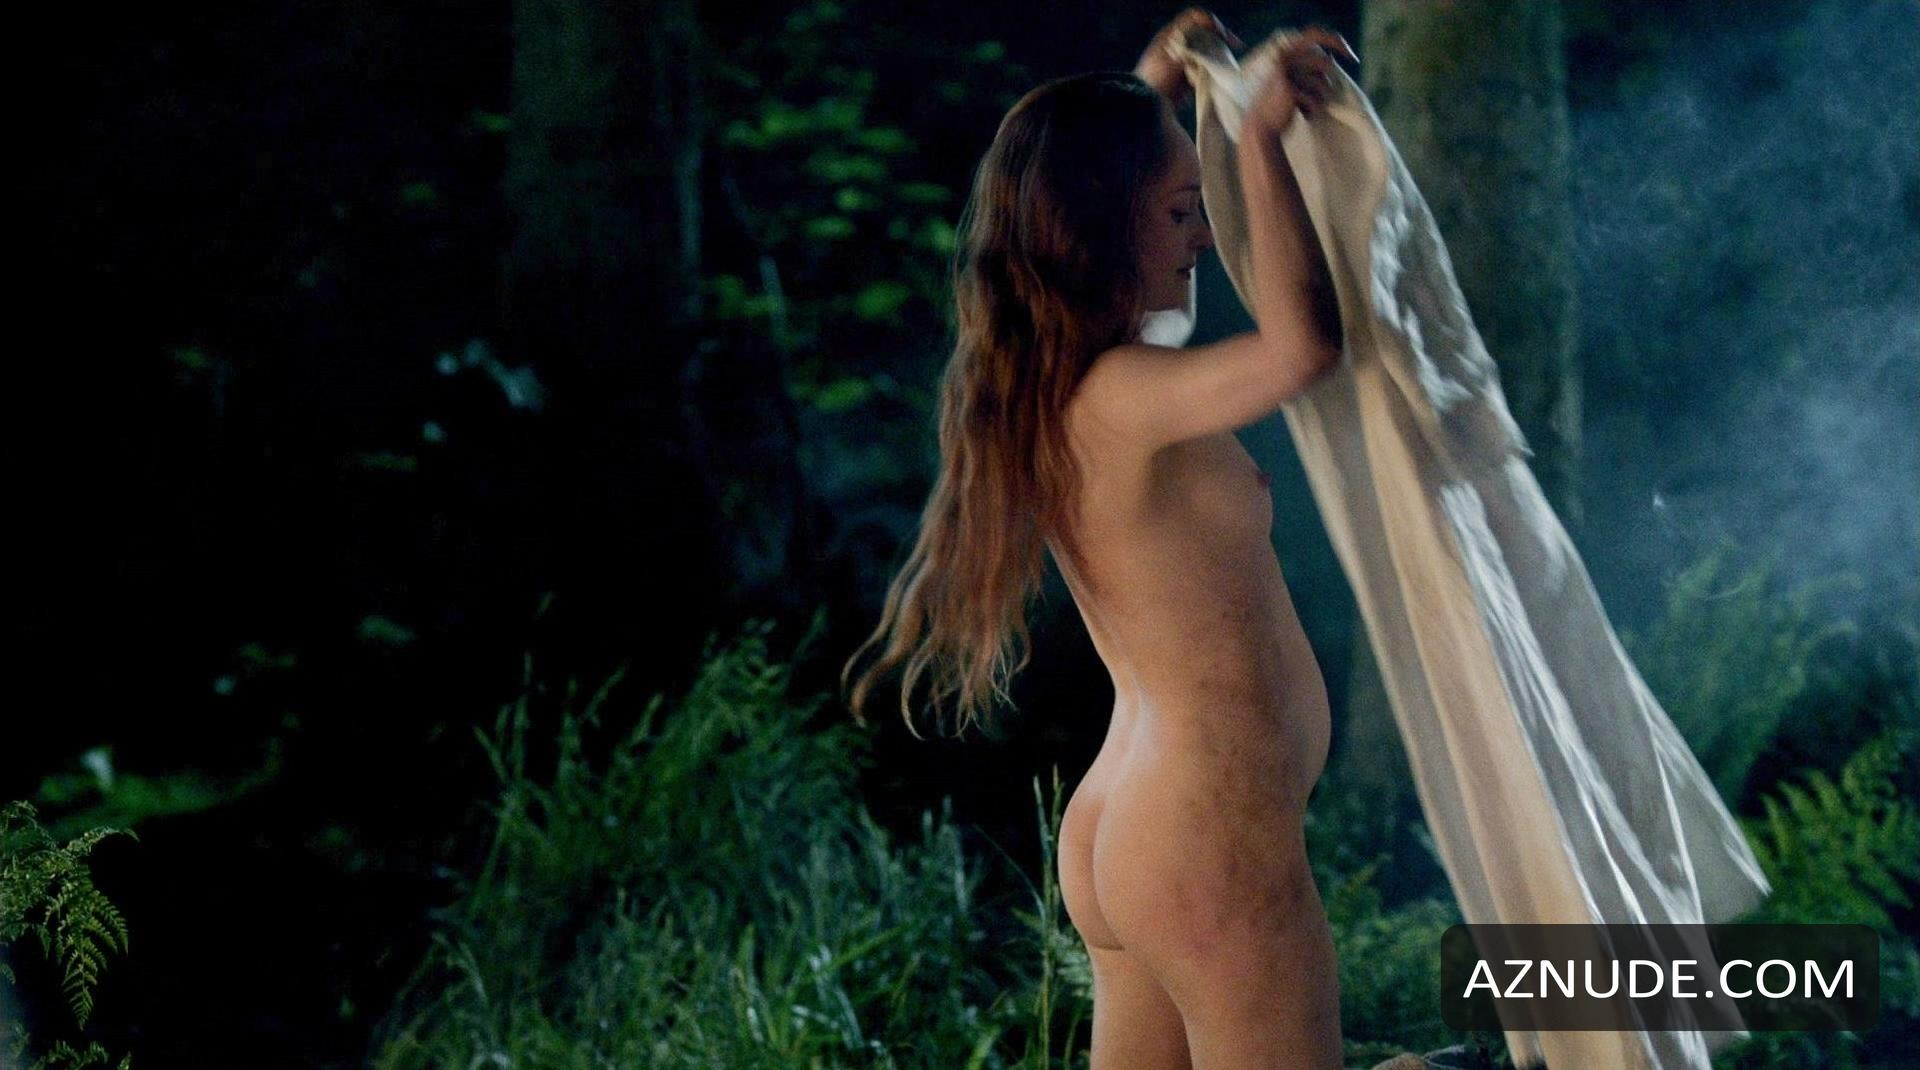 Caitriona balfe and lotte verbeek nude outlander s01e10